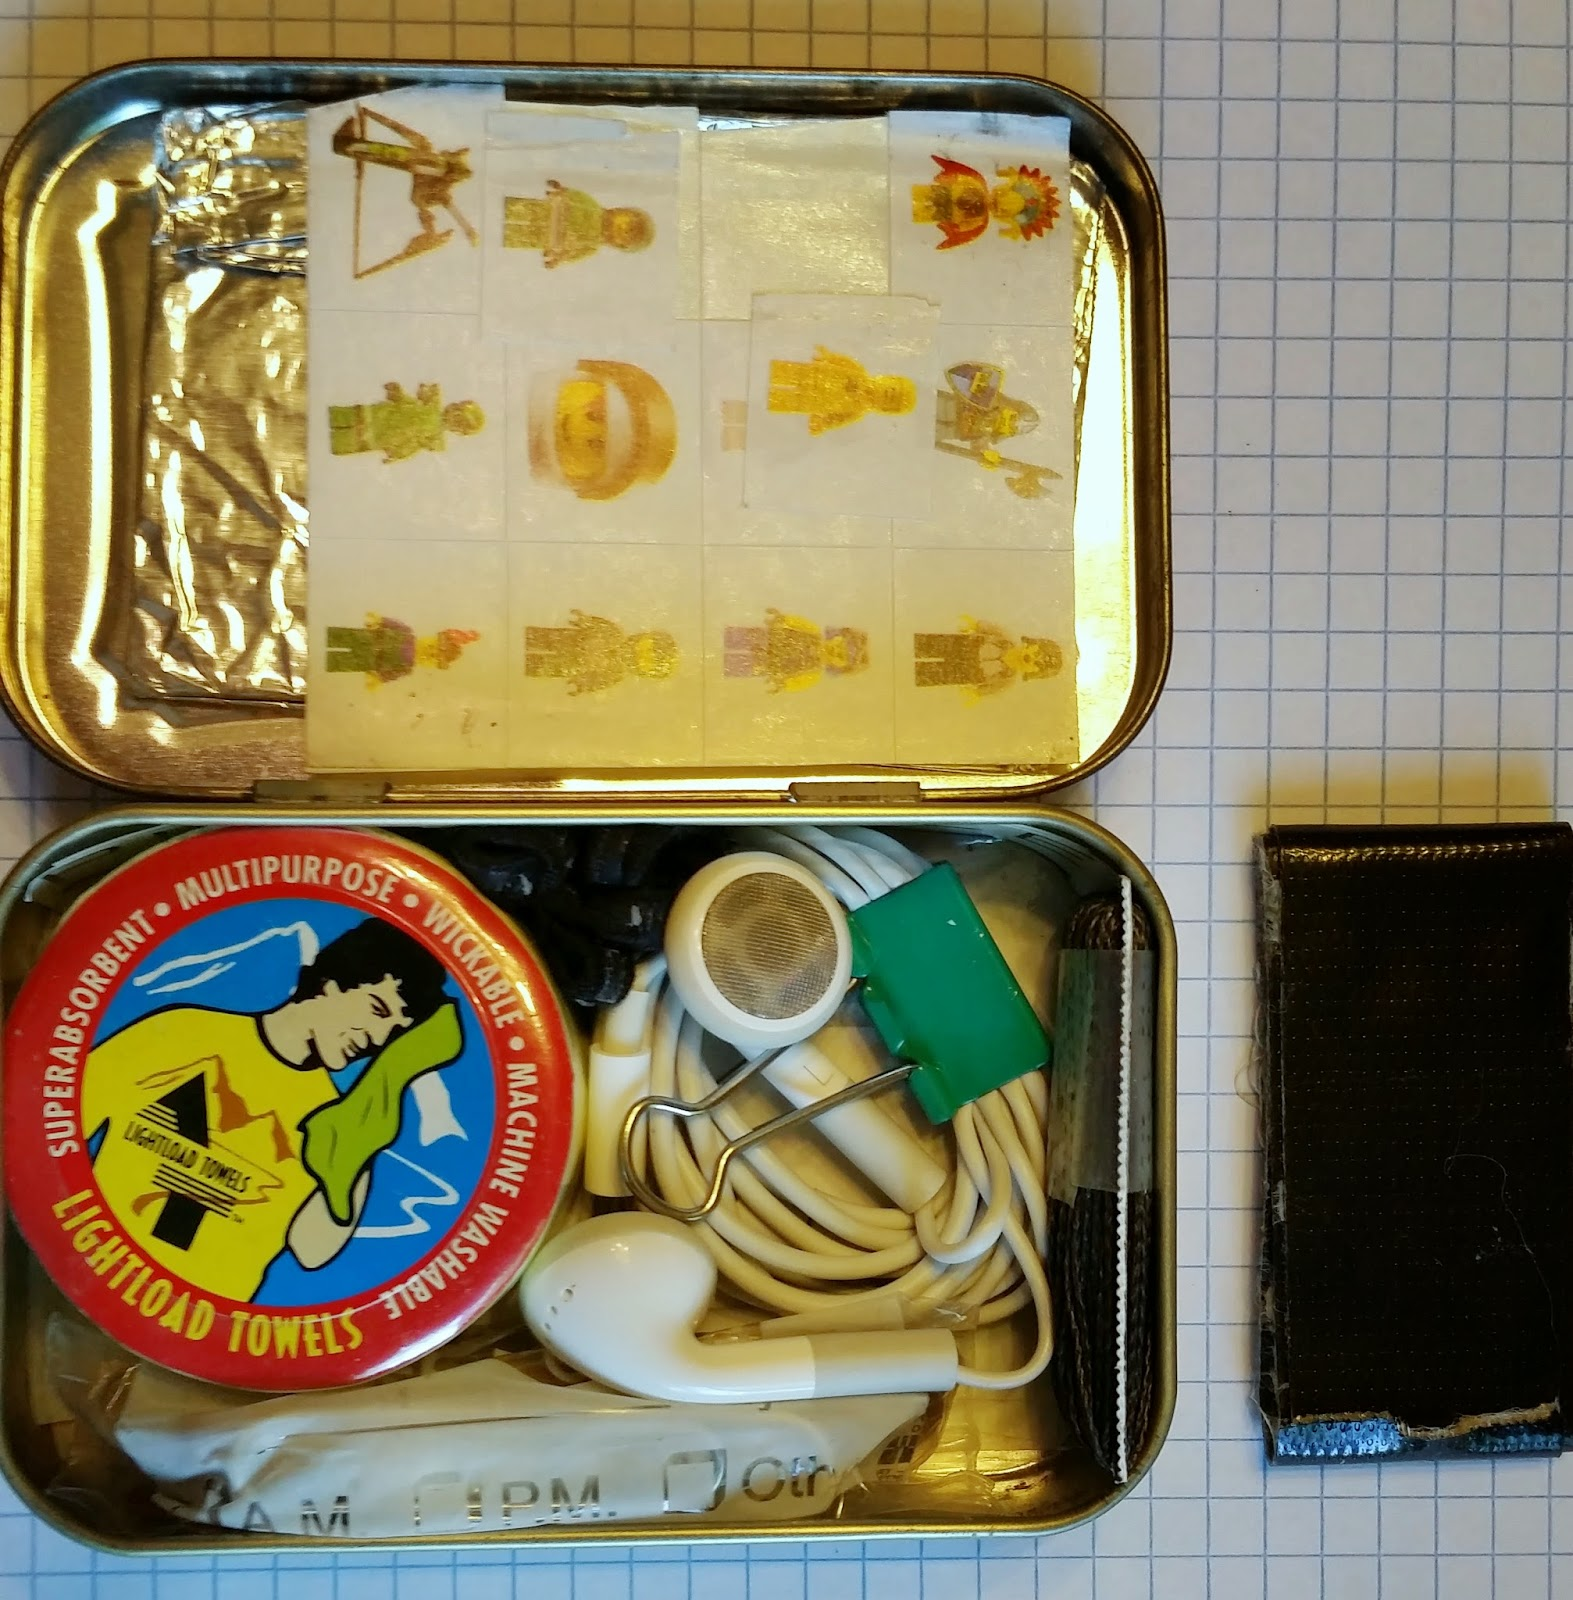 ben u0026 39 s journal  what u0026 39 s in the tin  my altoids kit  v2